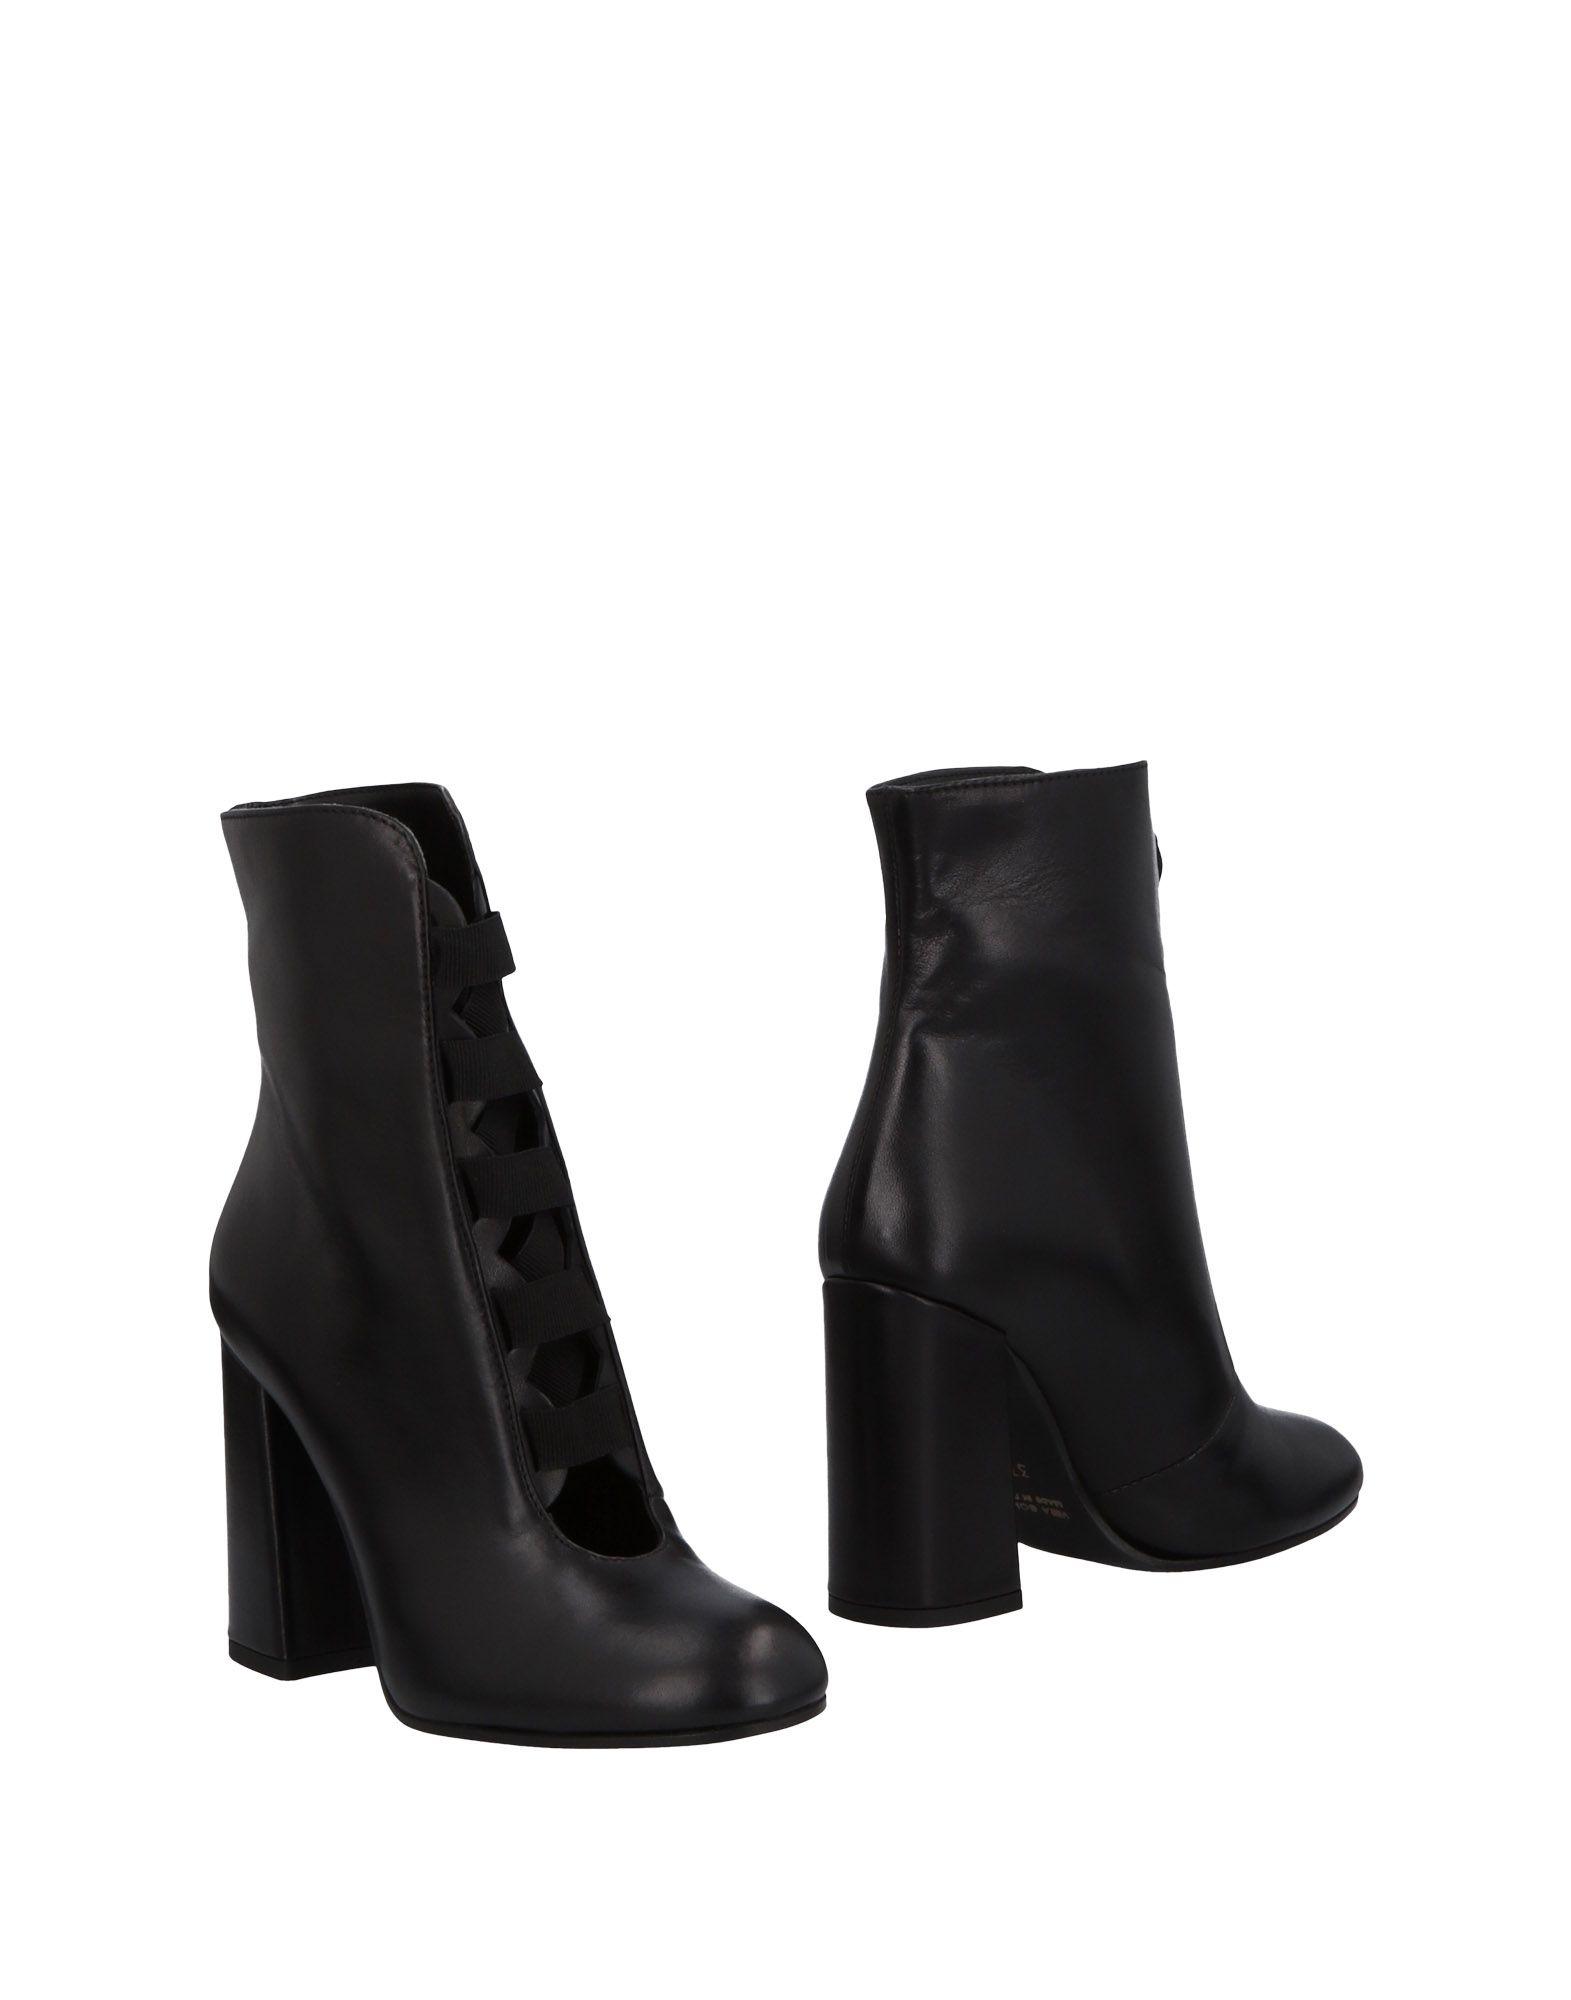 Gut um billige Schuhe Damen zu tragenSilvian Heach Stiefelette Damen Schuhe  11469141QJ 2dd994